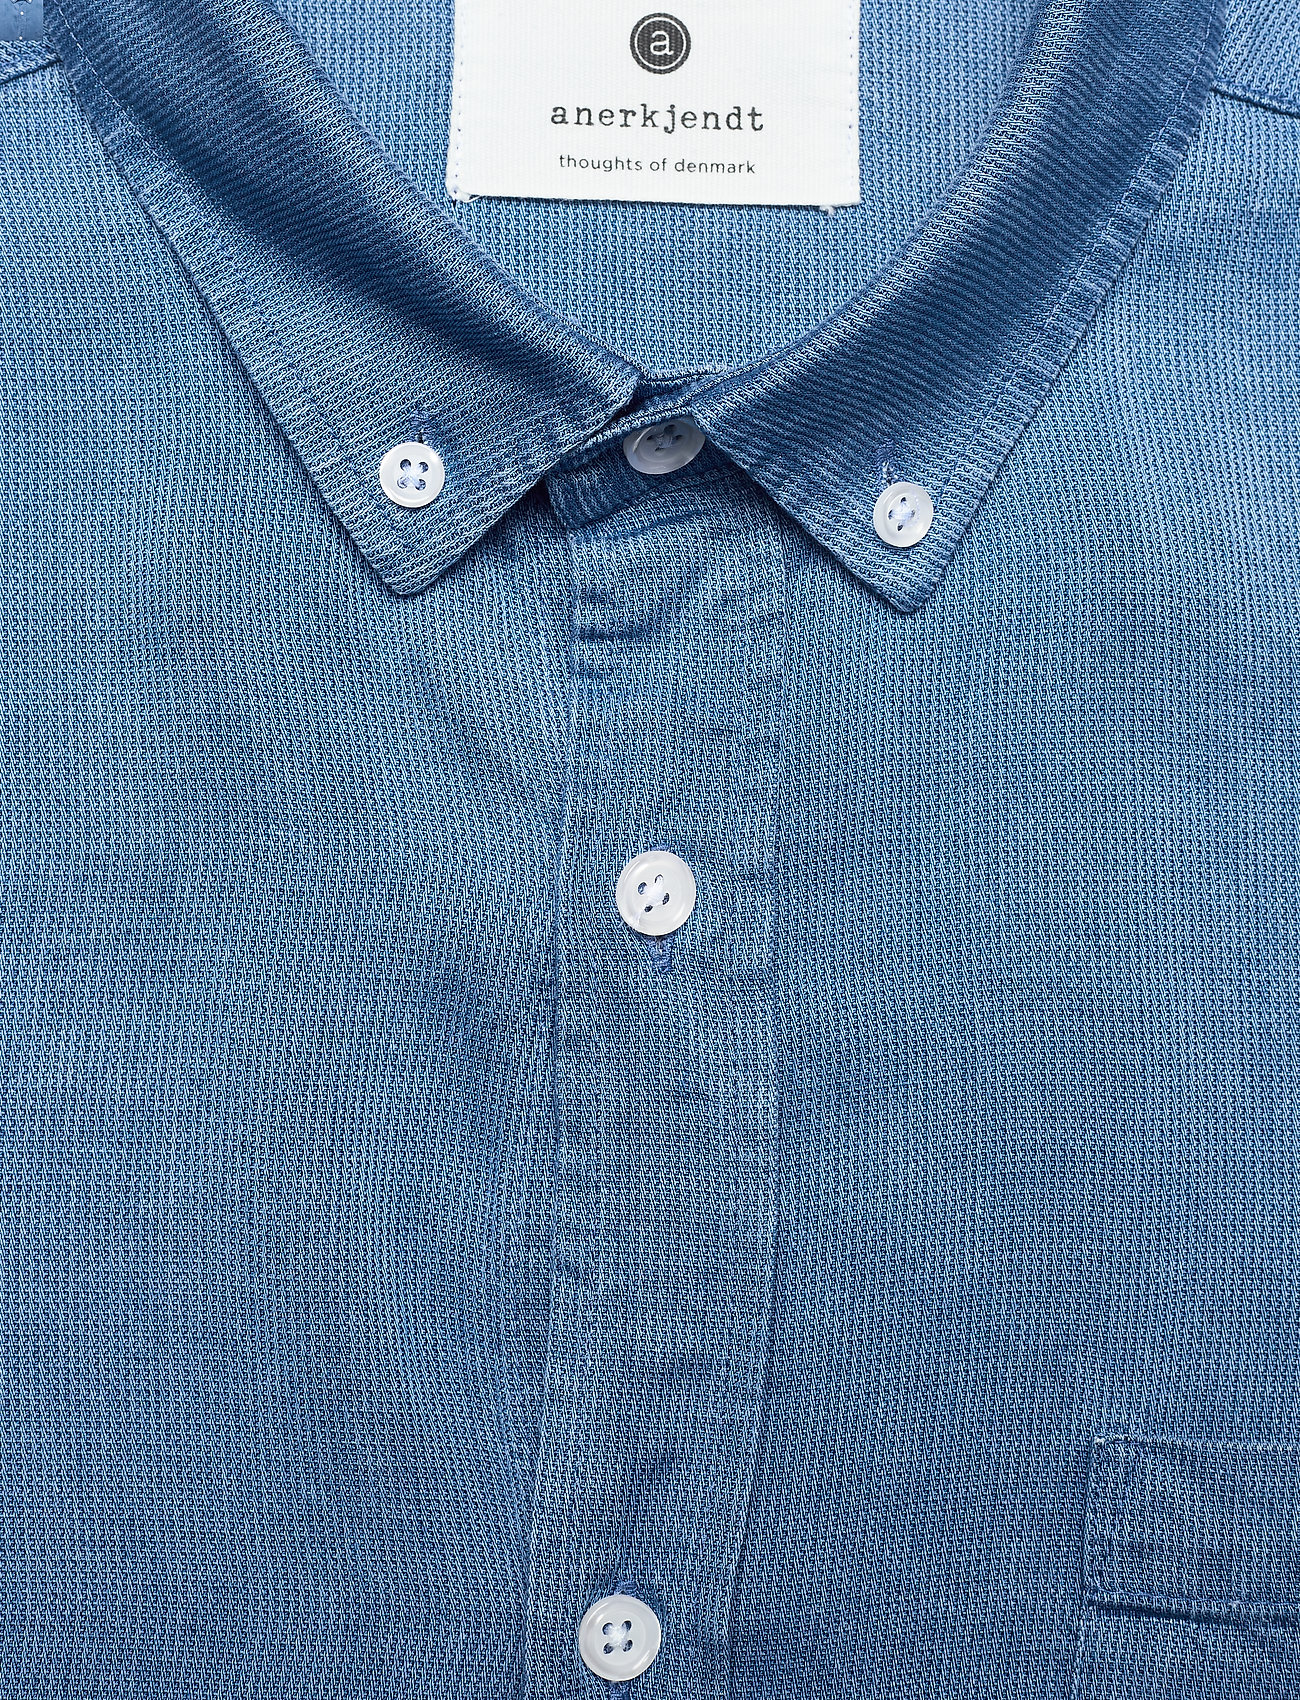 Anerkjendt - AKKONRAD LS TENSEL - linnen overhemden - copen blue - 5